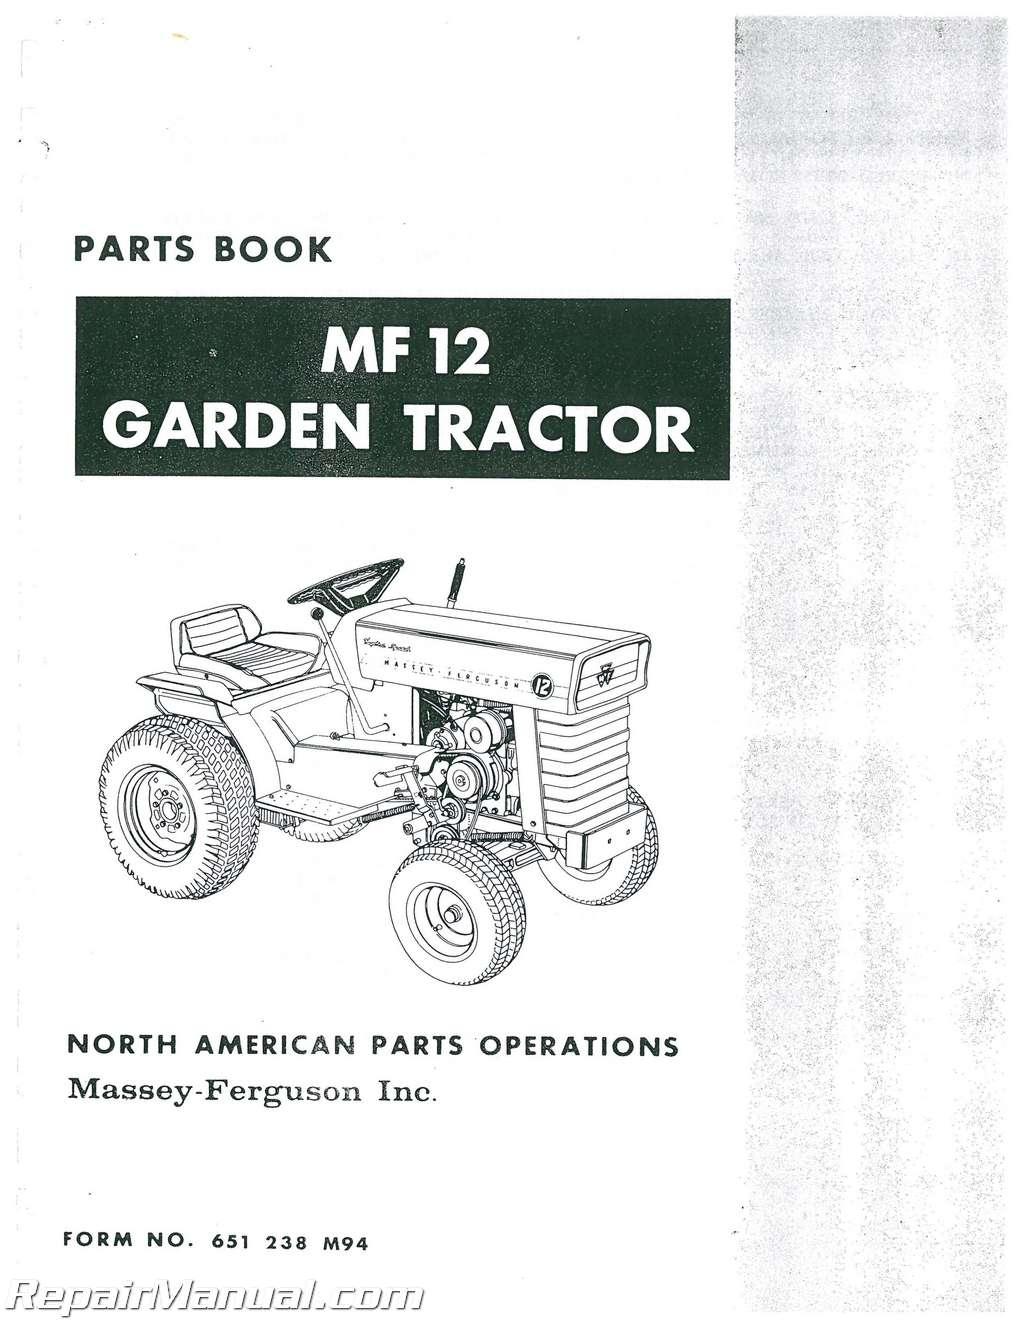 Massey Ferguson Garden Tractor Parts : Massey ferguson mf garden tractor with equipment parts